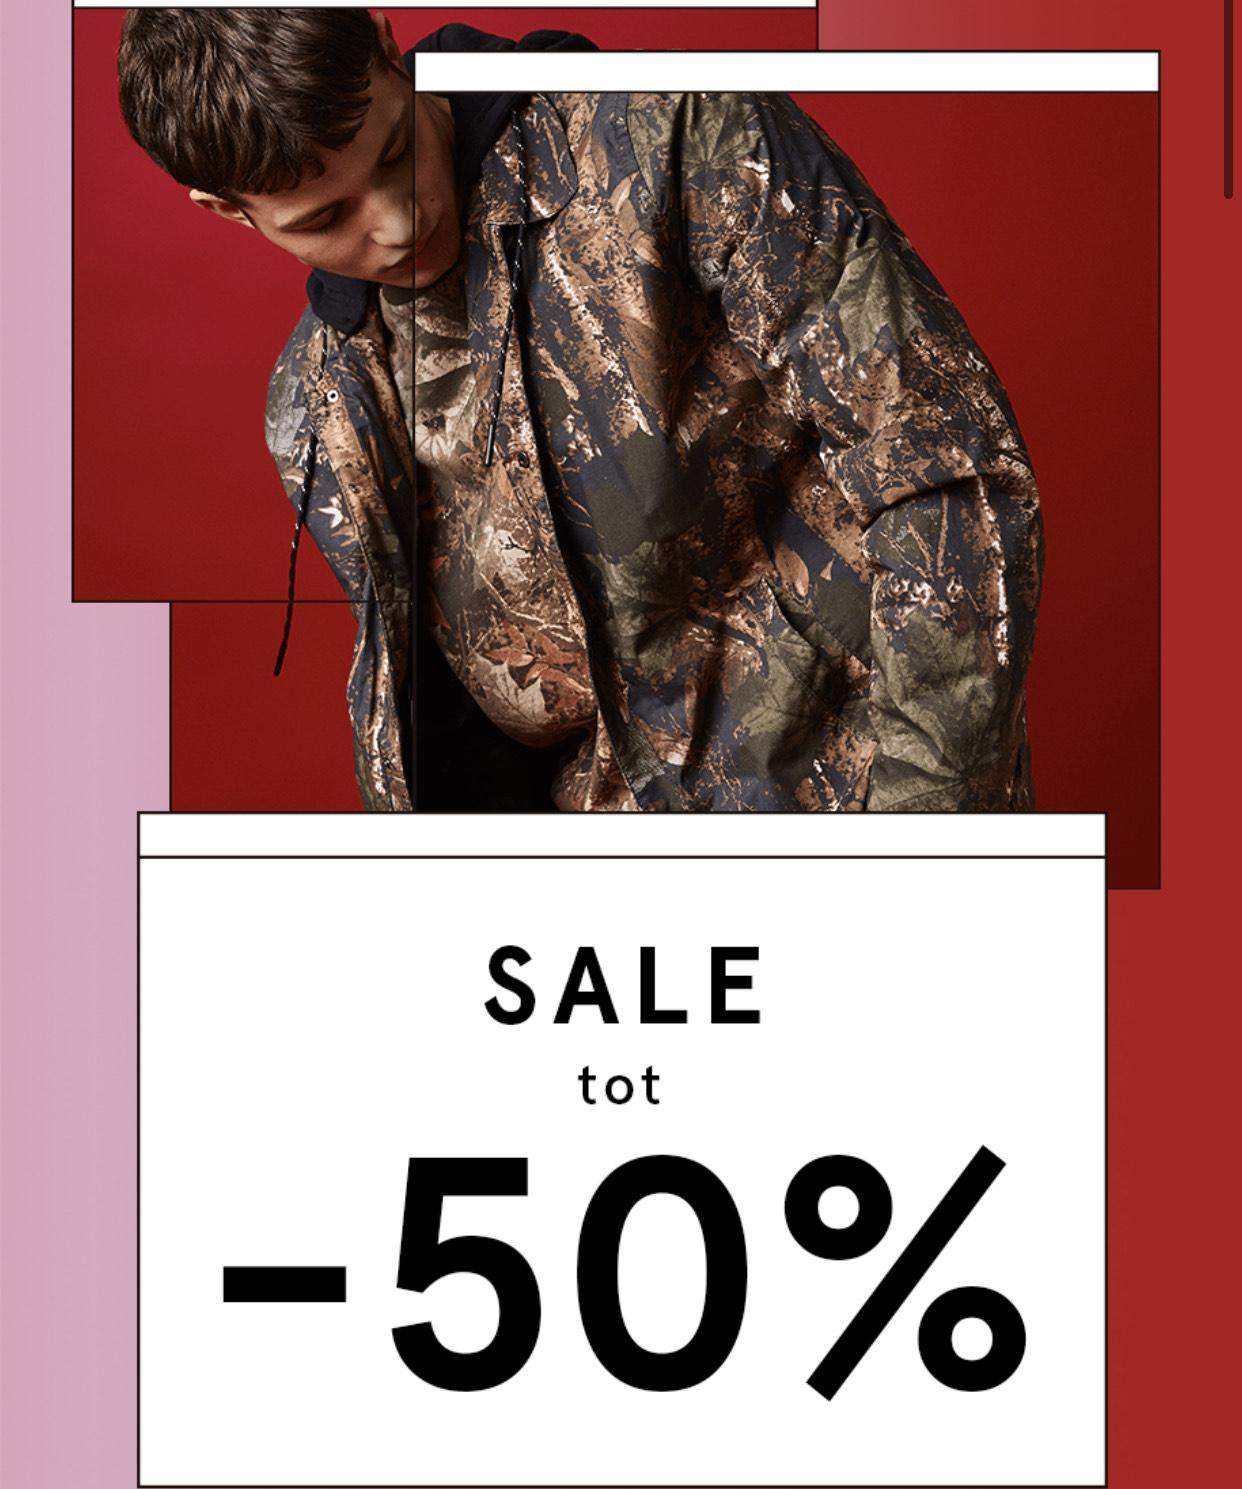 Bershka sale